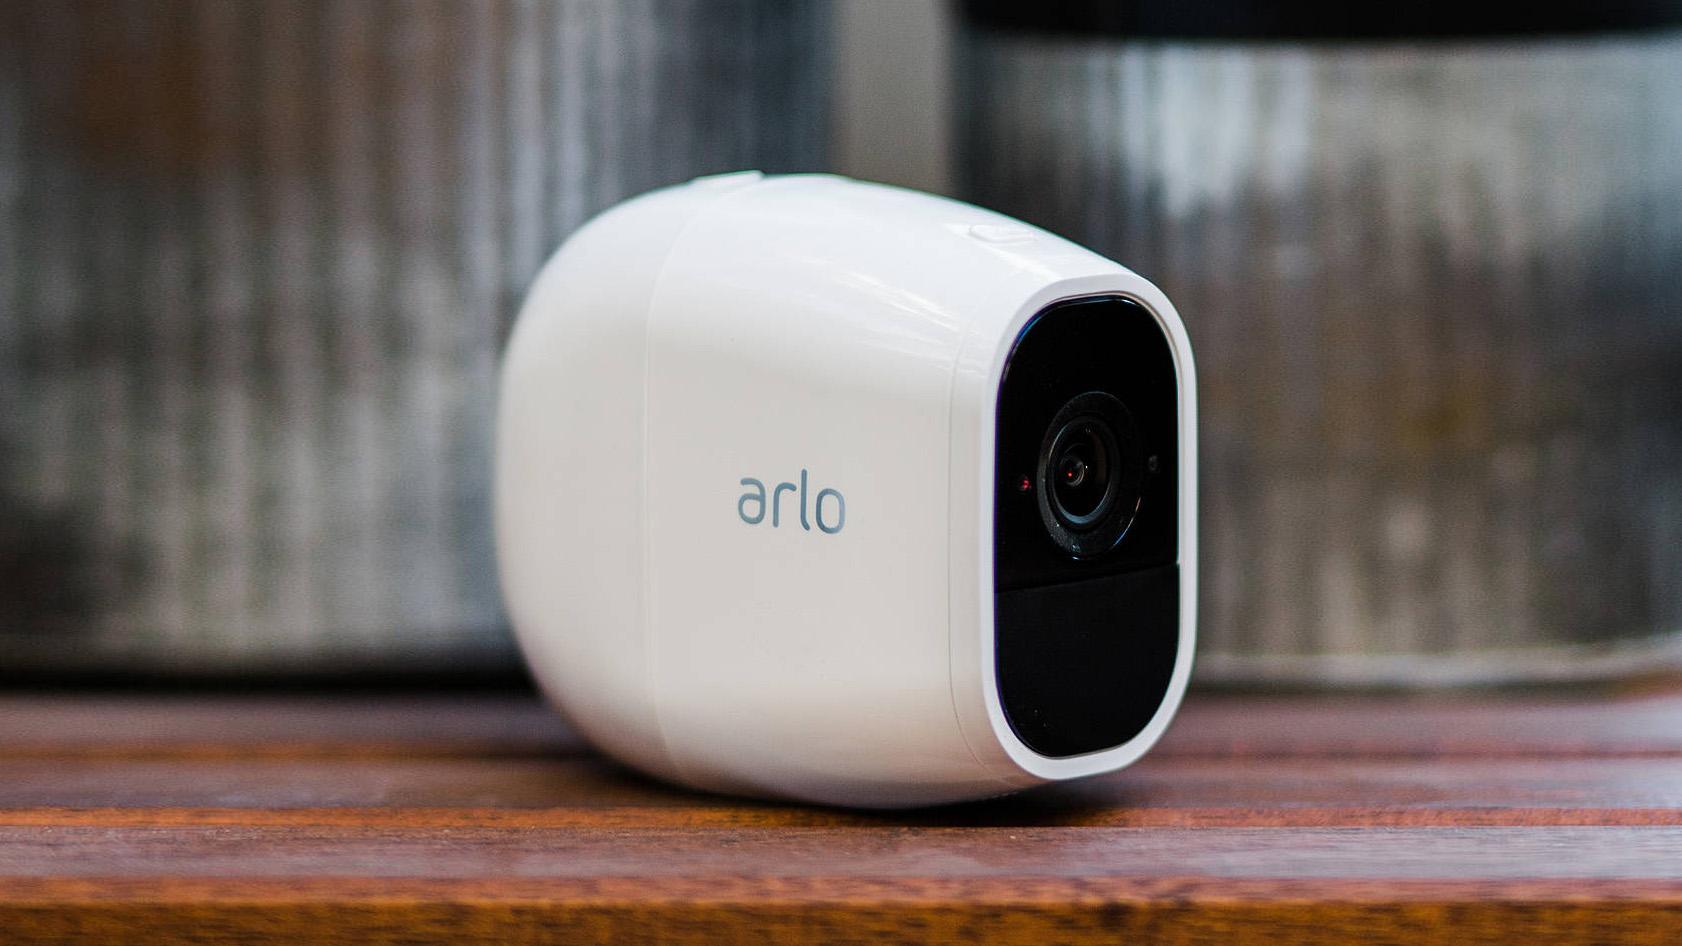 Best Wireless Security Camera 2019 | Top Ten Reviews